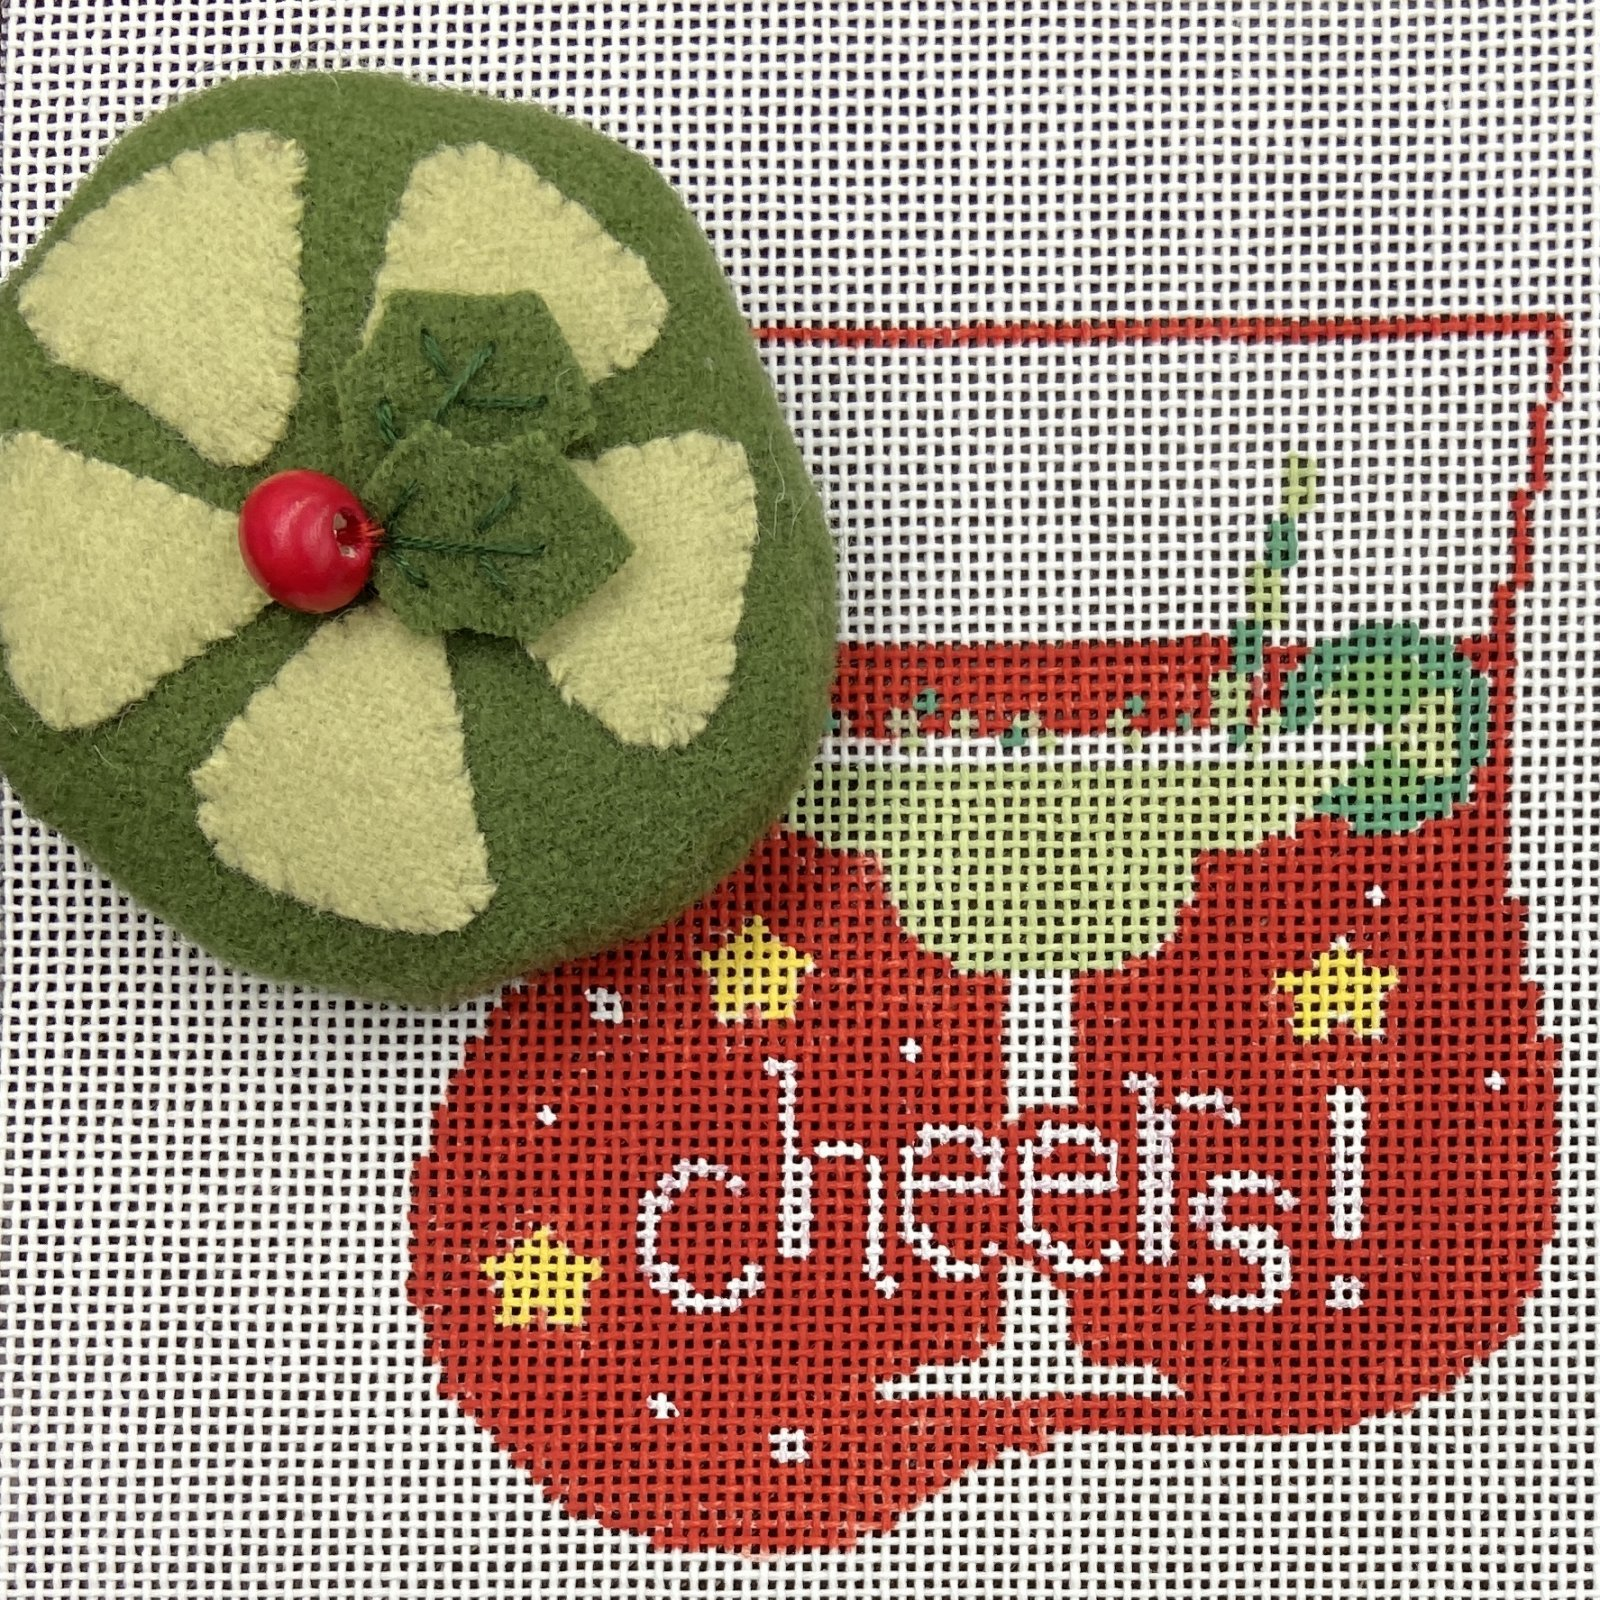 KSCM591 Margarita Time with Cheer Christmas Ornament Kathy Schenkel